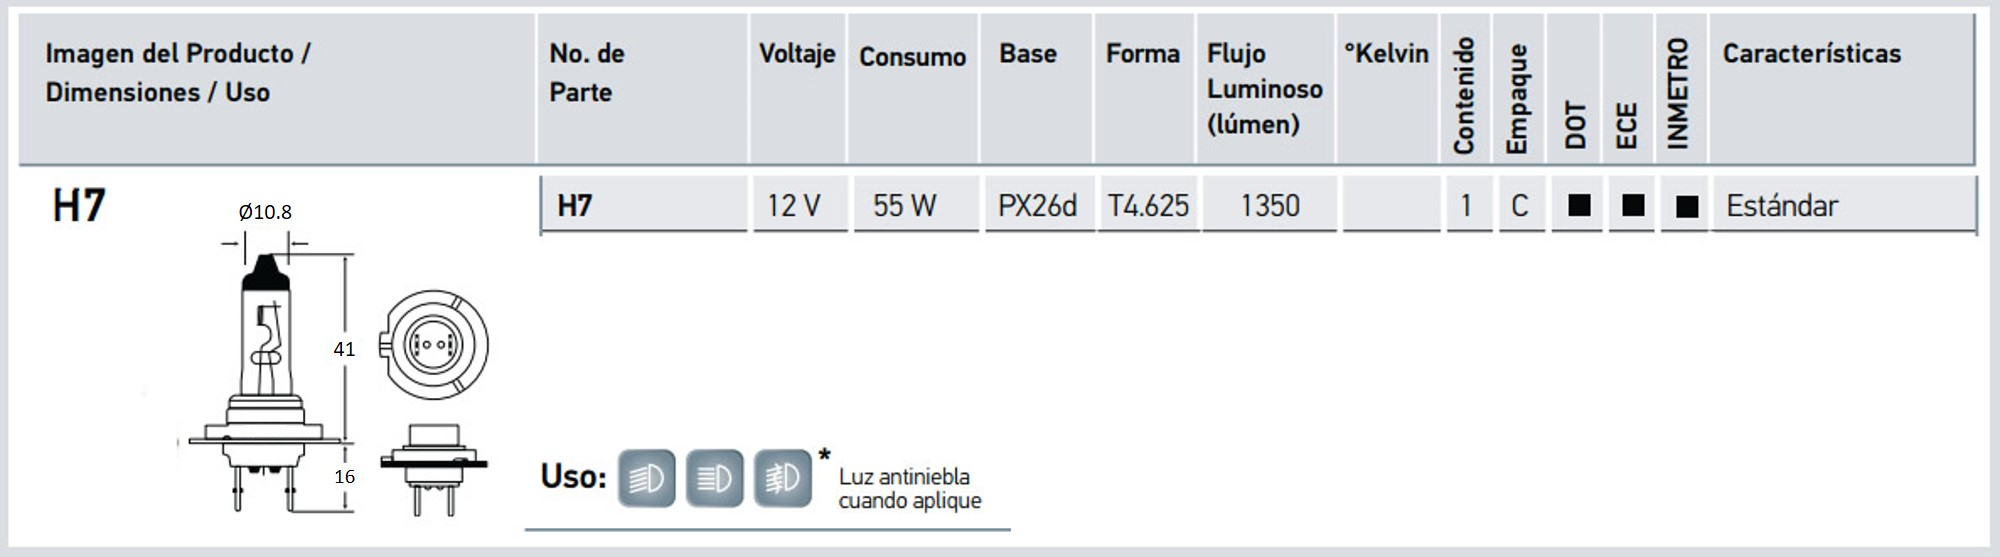 h7 12v ficha tecnica autodata sac